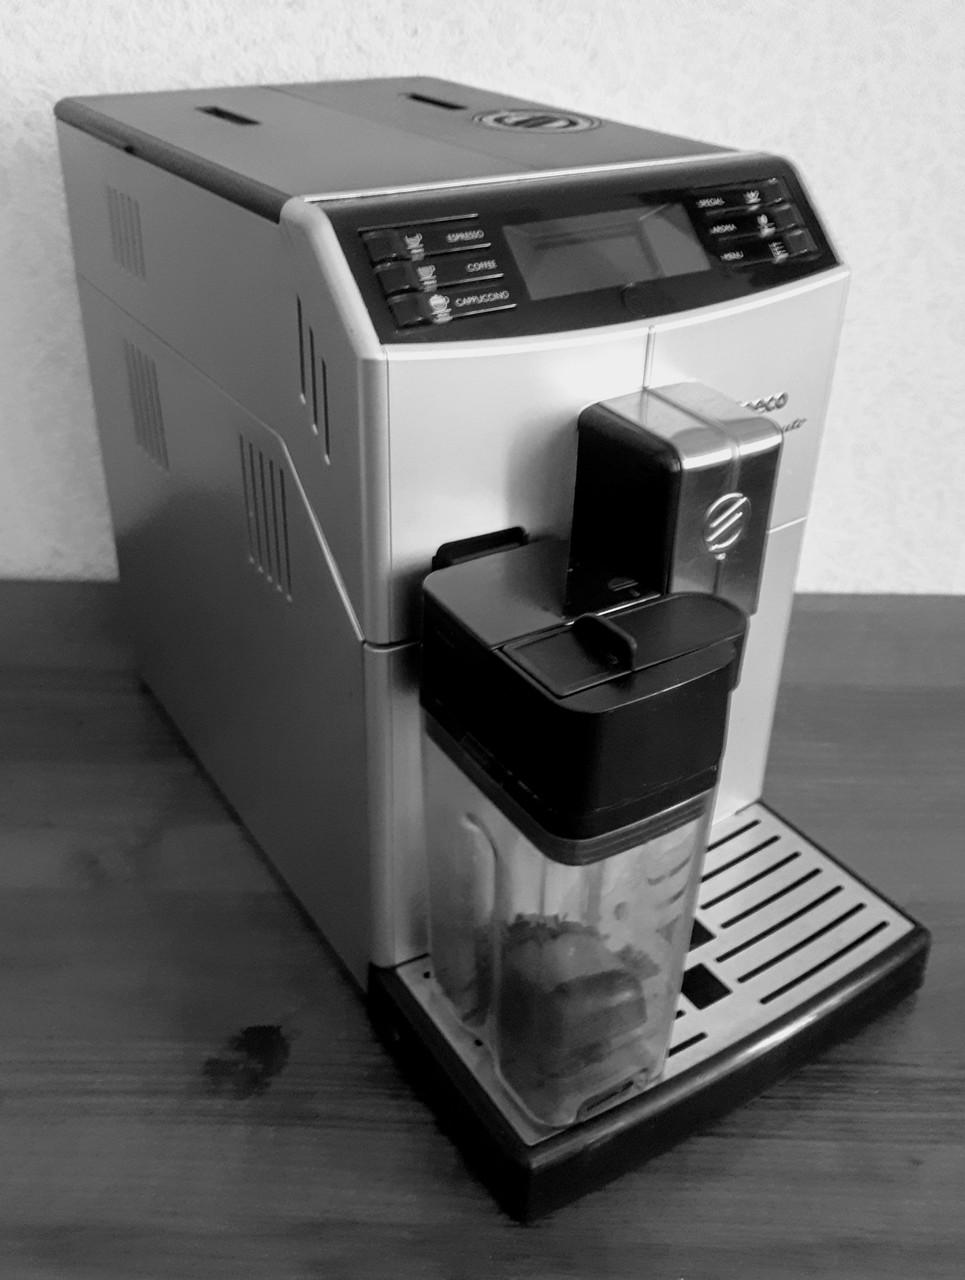 Кофемашина Saeco Minuto 3100 HD 8826/09